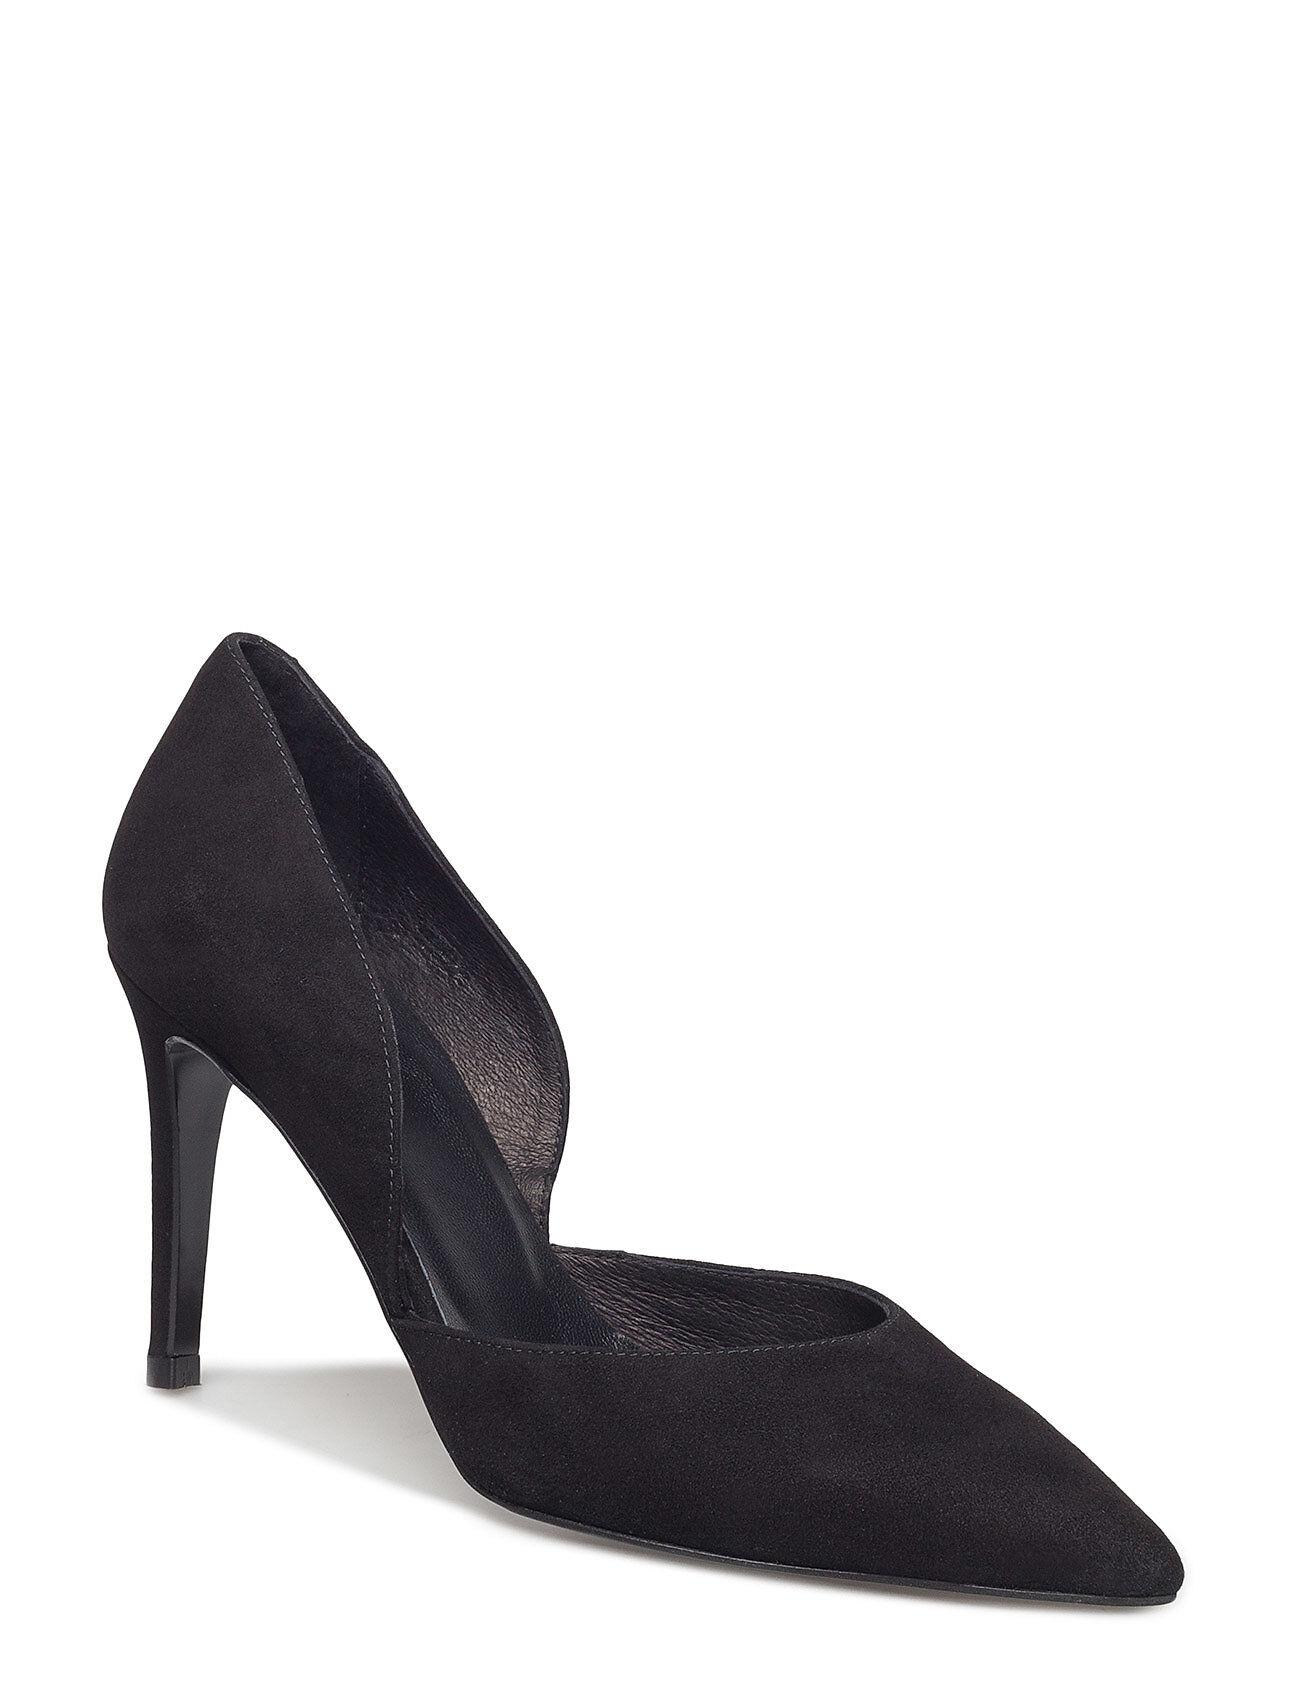 Henry Kole Bianca Shoes Heels Pumps Classic Musta Henry Kole